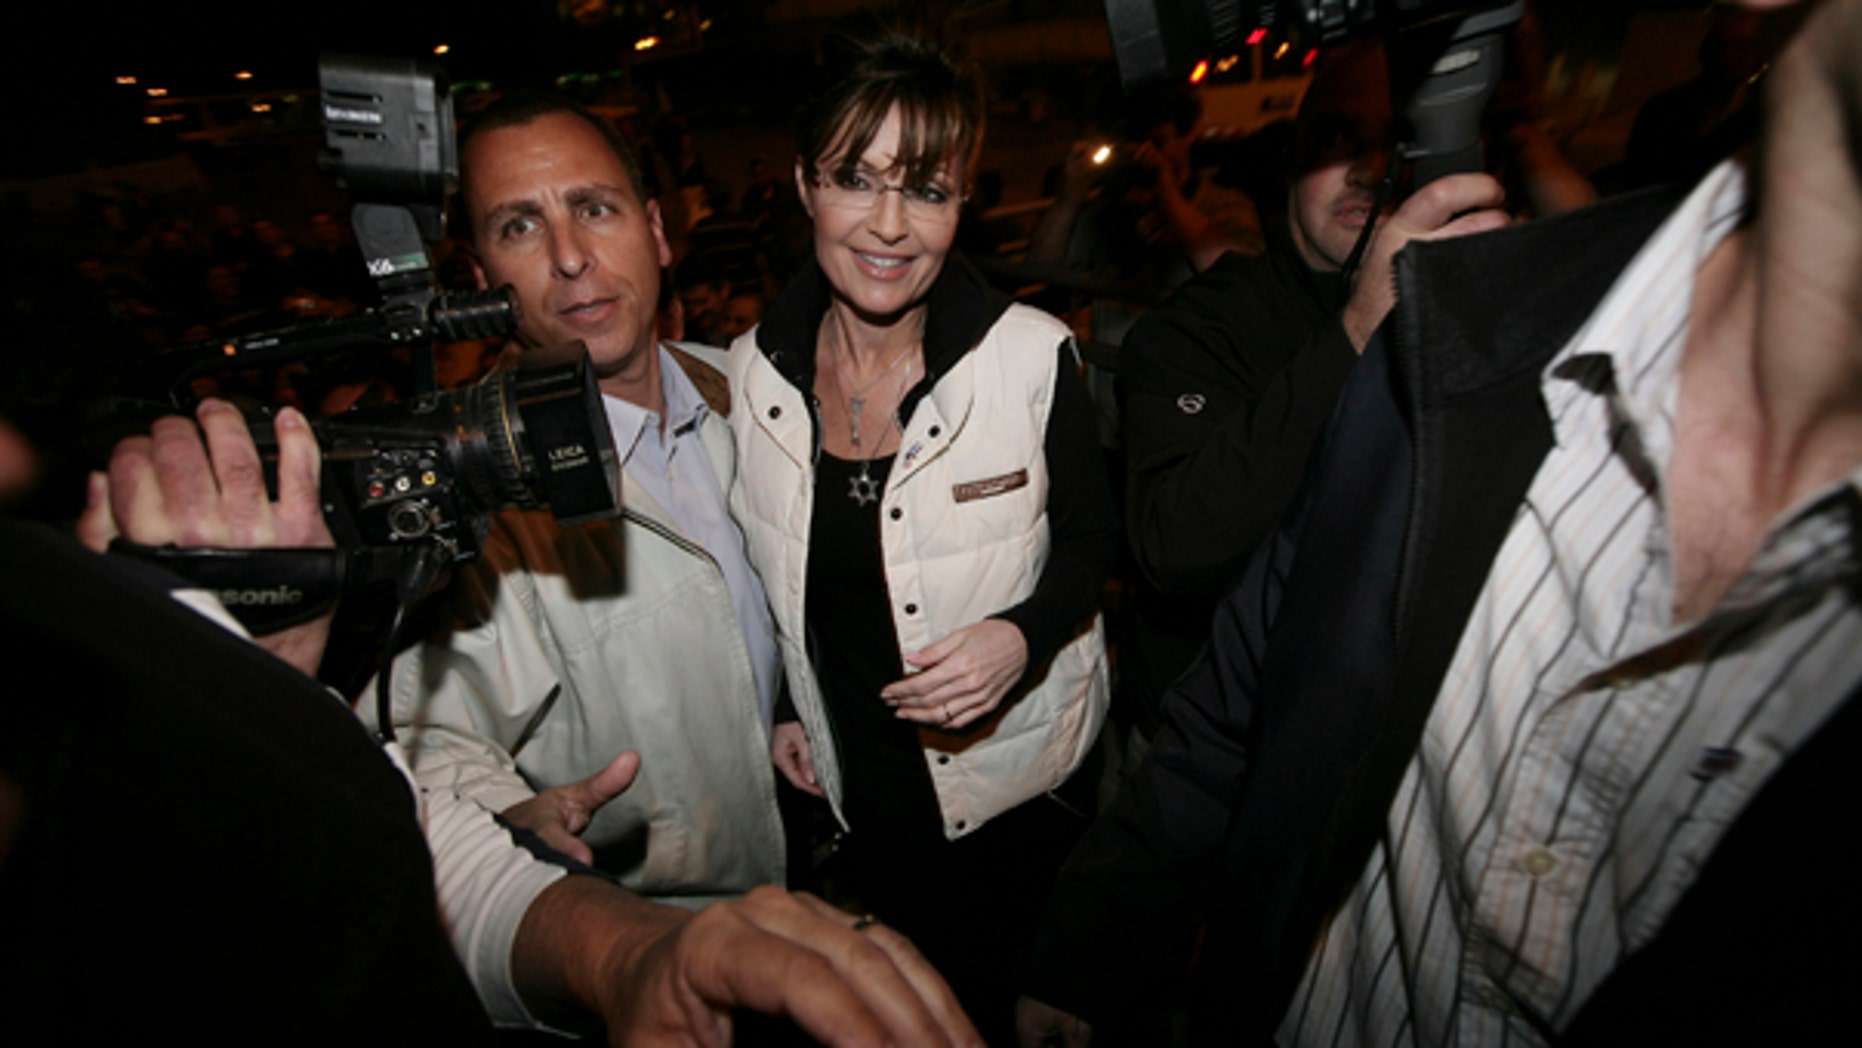 Sunday: Former Alaska Gov. Sarah Palin arrives at the Western Wall tunnels in Jerusalem's Old City.